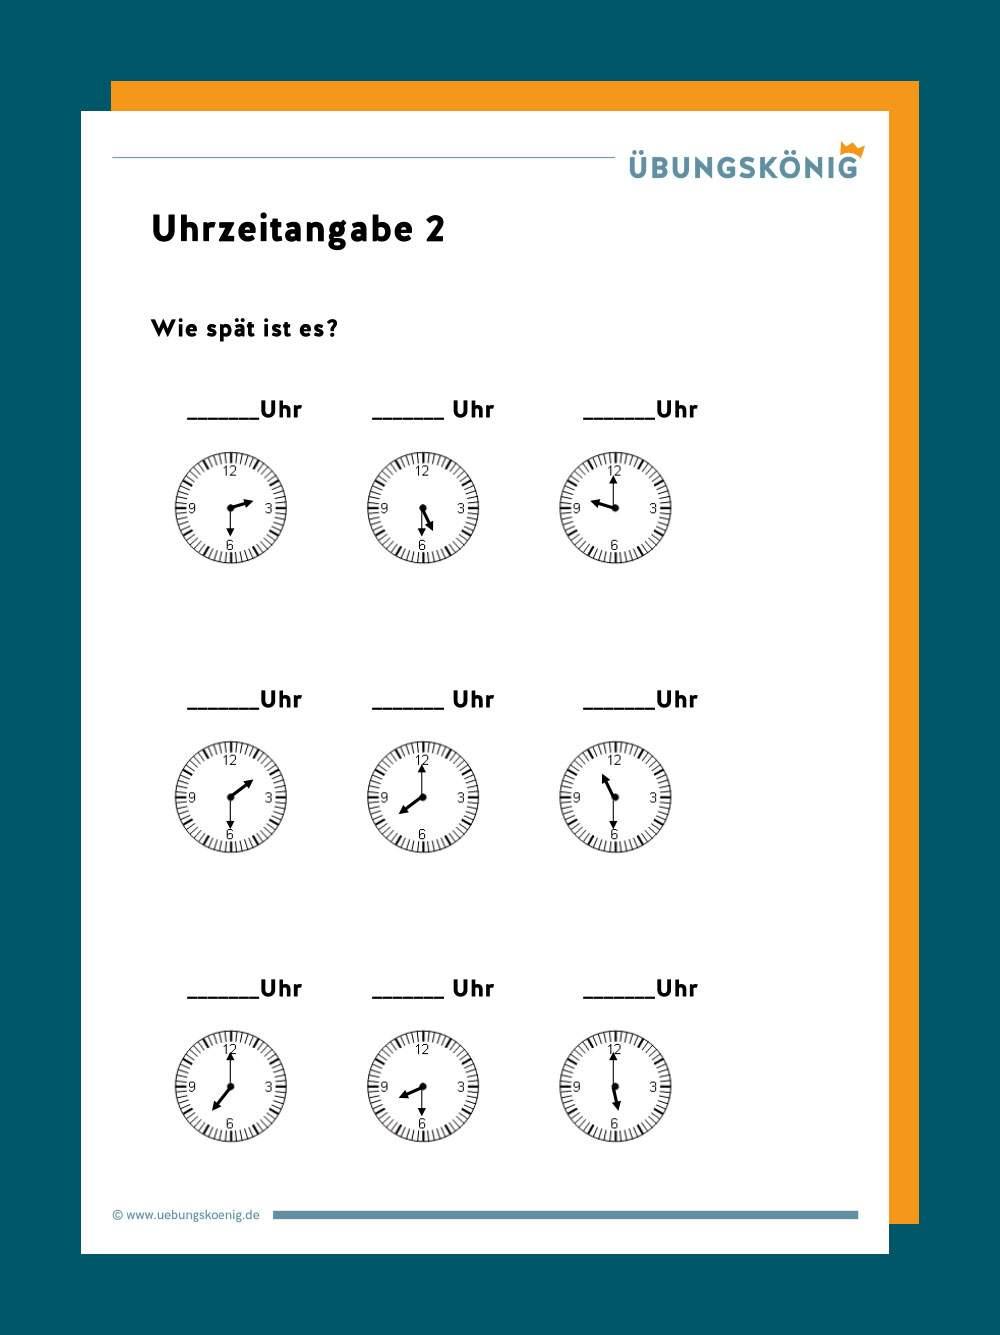 DaZ / DaF Datum / Uhrzeit